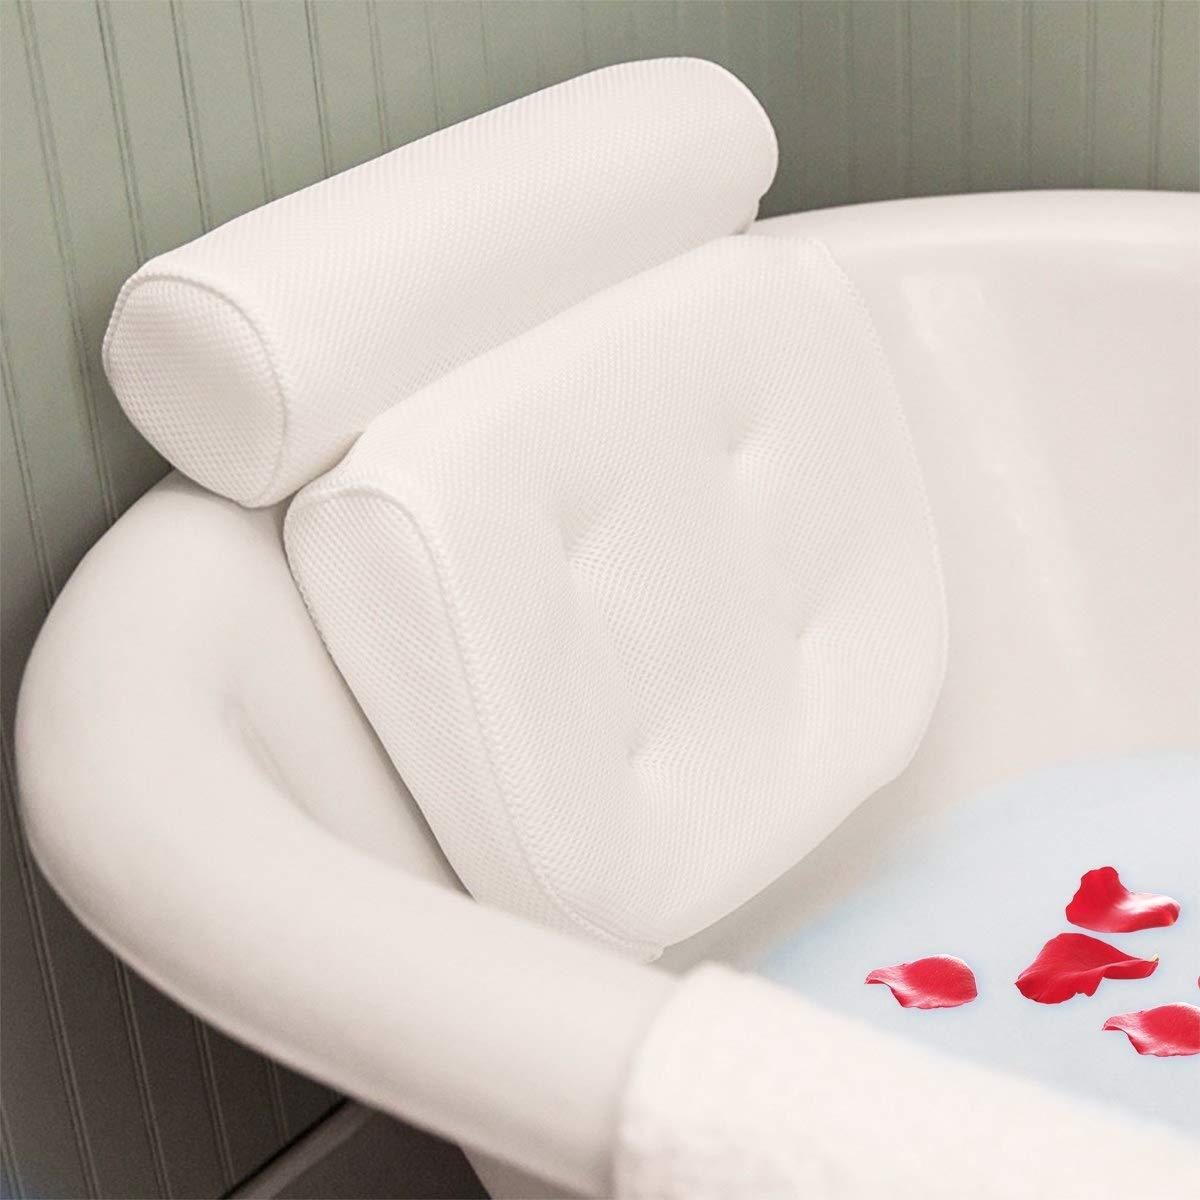 Essort Bath Pillow Spa, Bath Pillow with Suction Cups, Ergonomic Home Spa Headrest for Bathtub, Hot Tub, Jacuzzi, Home Spa (38 X 36 X 8.5 cm) Blue